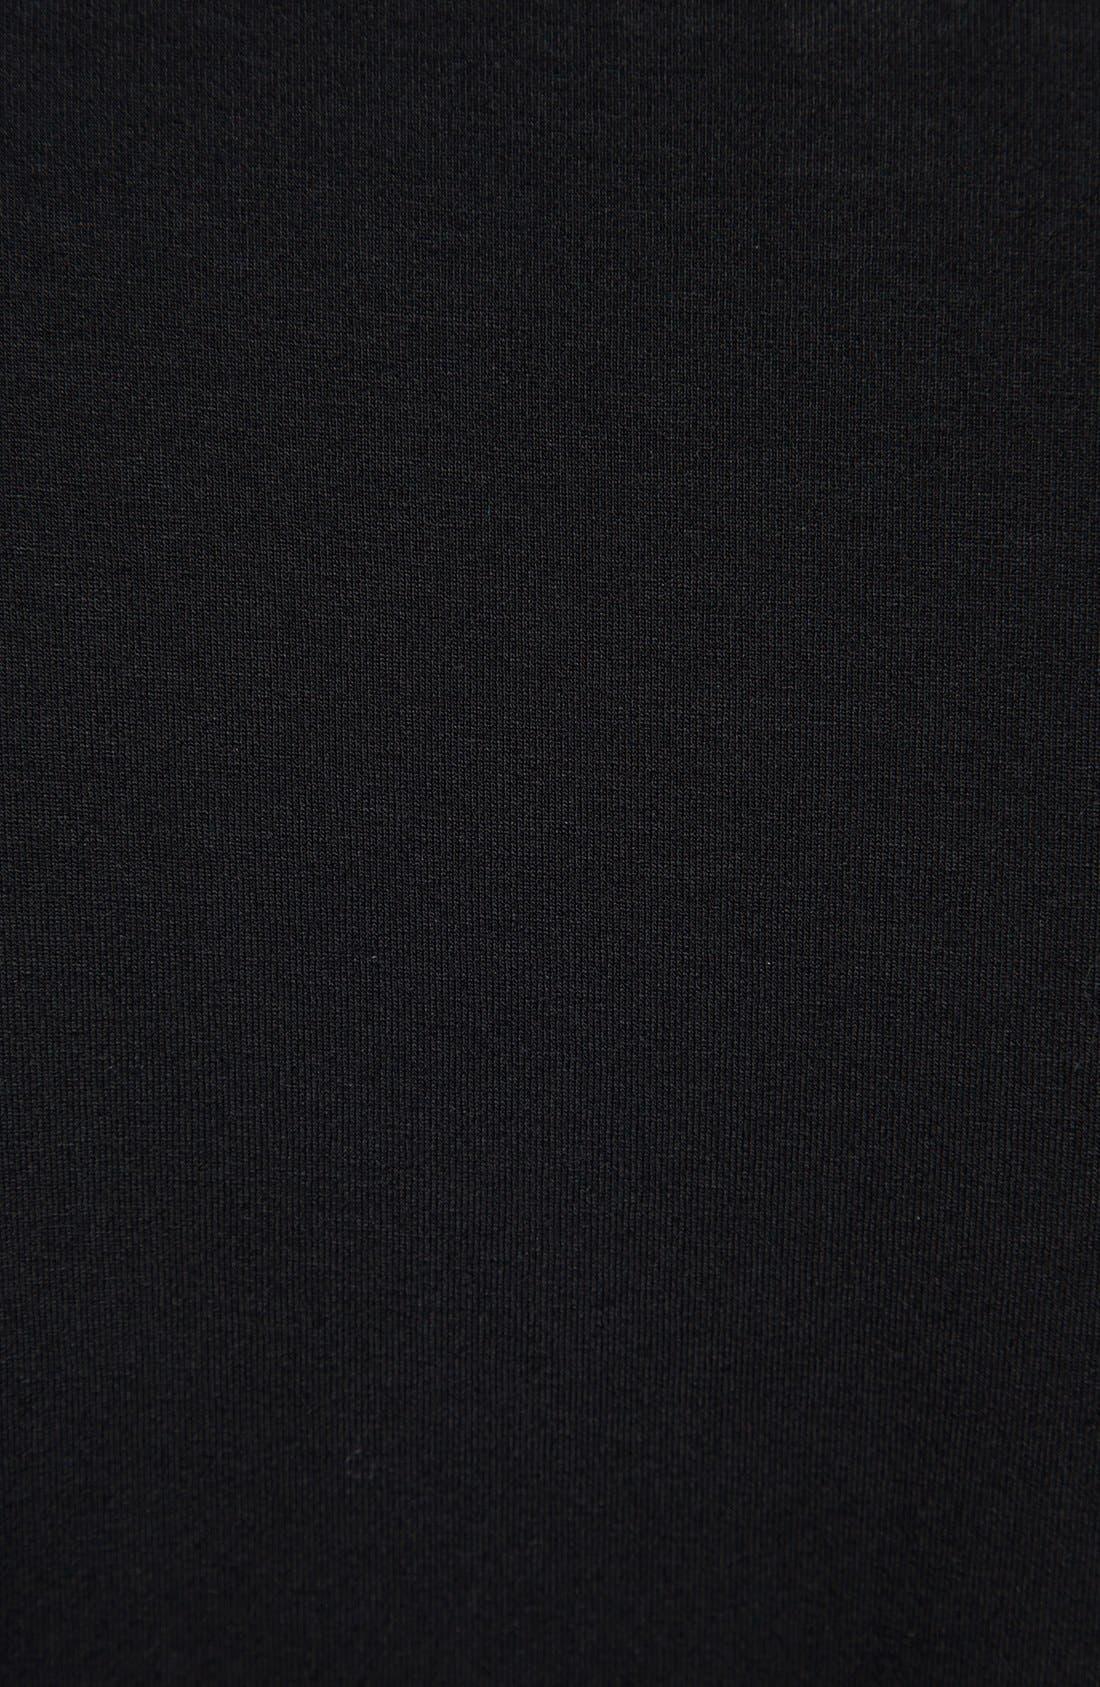 Alternate Image 3  - Vince Camuto Peplum Top (Plus Size)